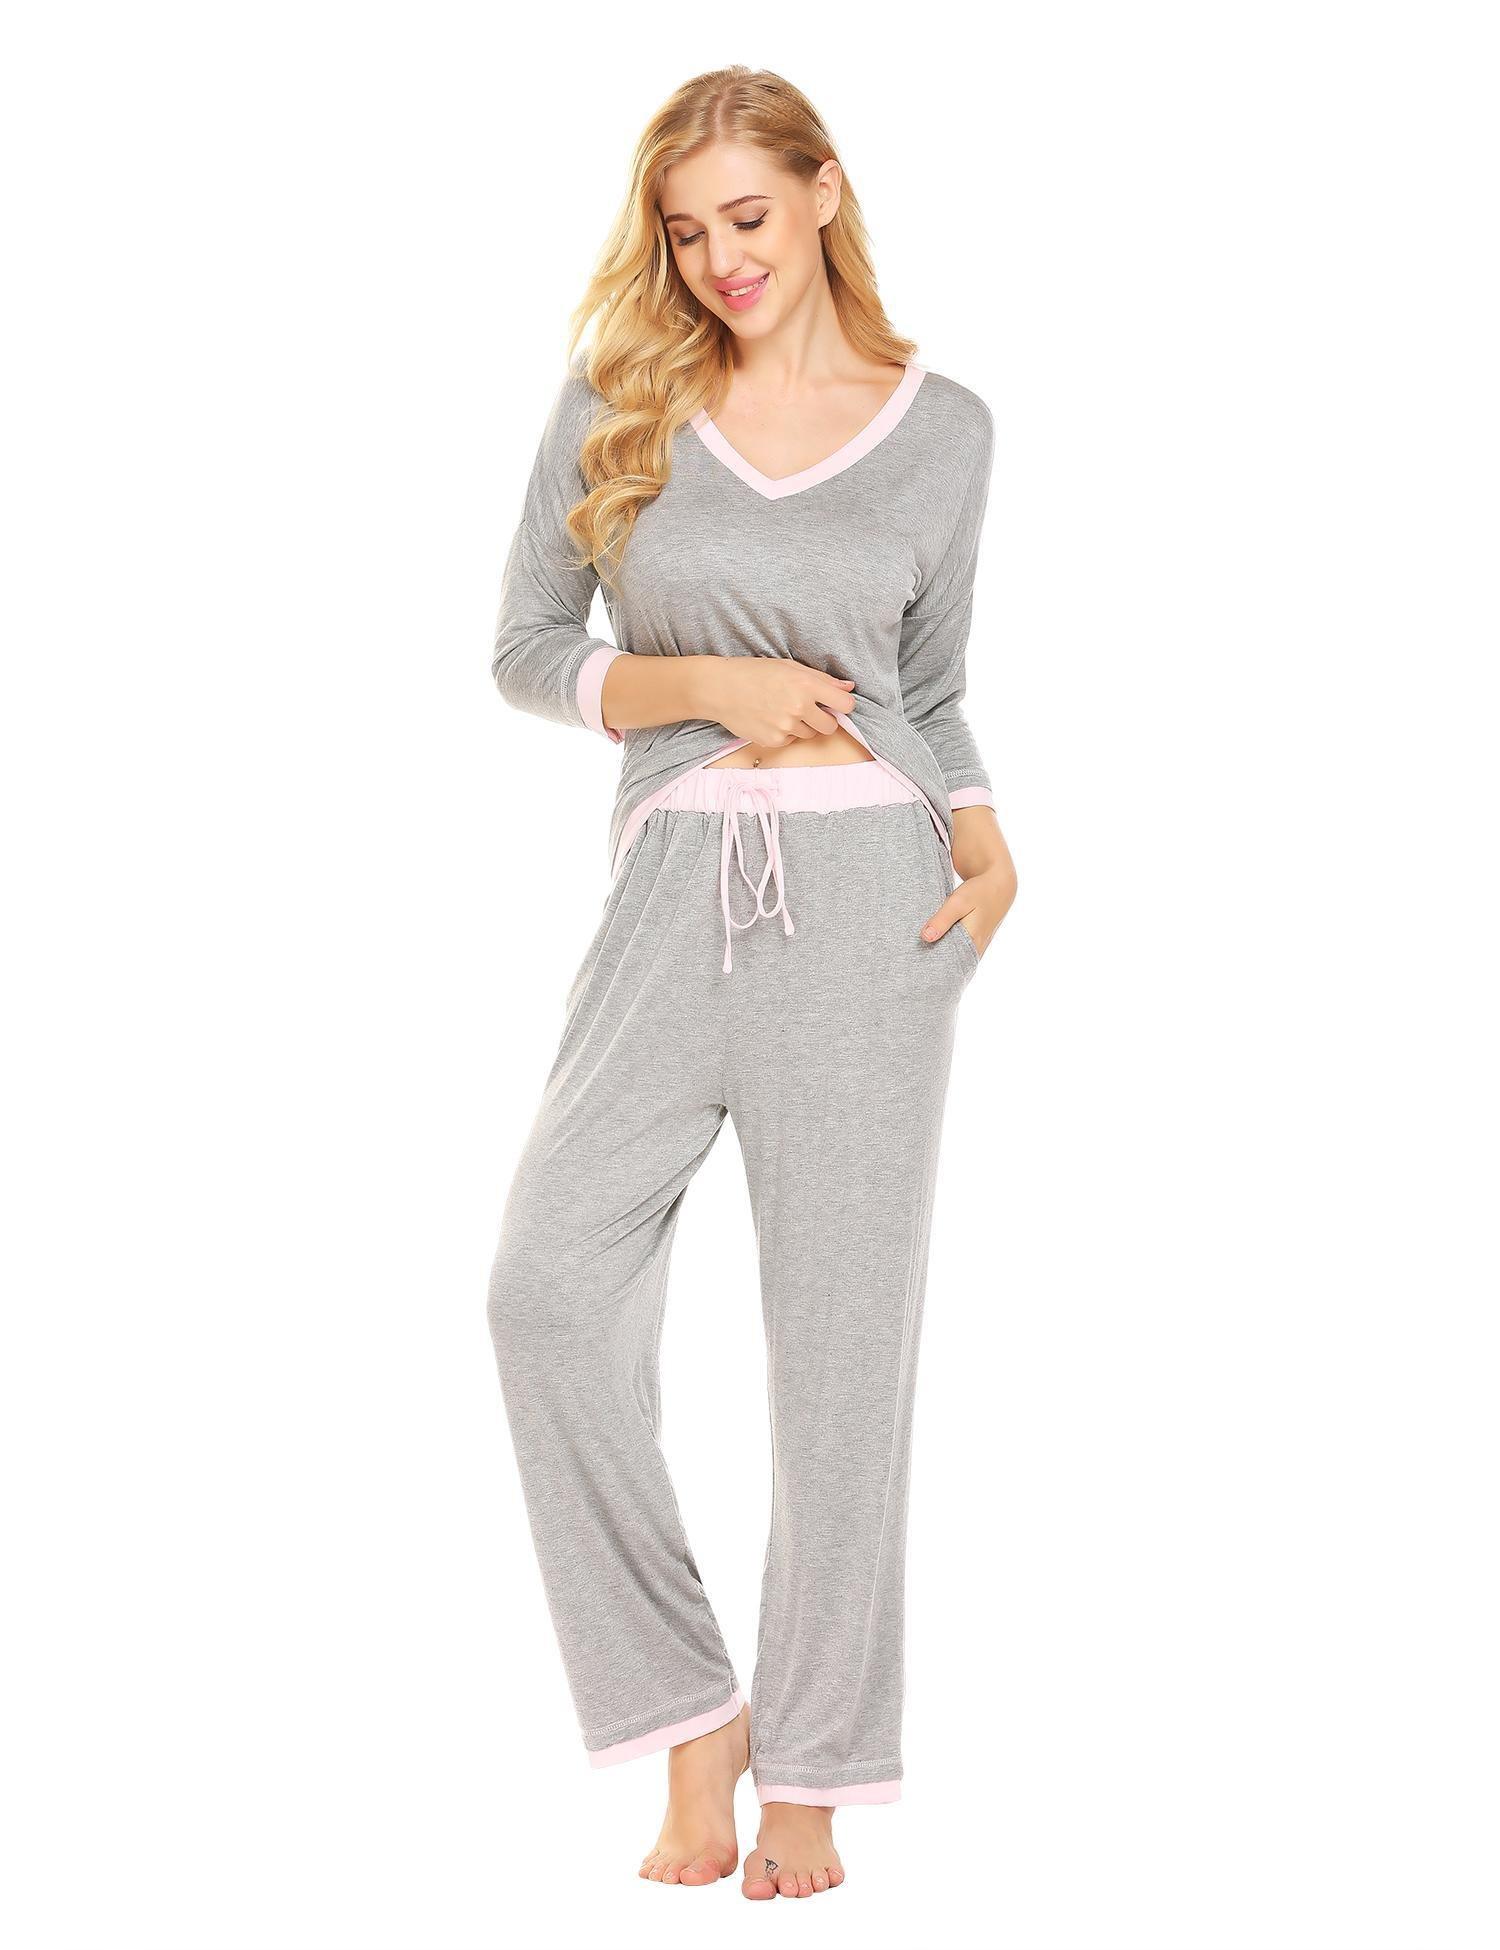 Ekouaer Women's Comfort Pajamas V-Neck Sleepwear Top with Pants Pajama Set Long Sleeve Pj Set